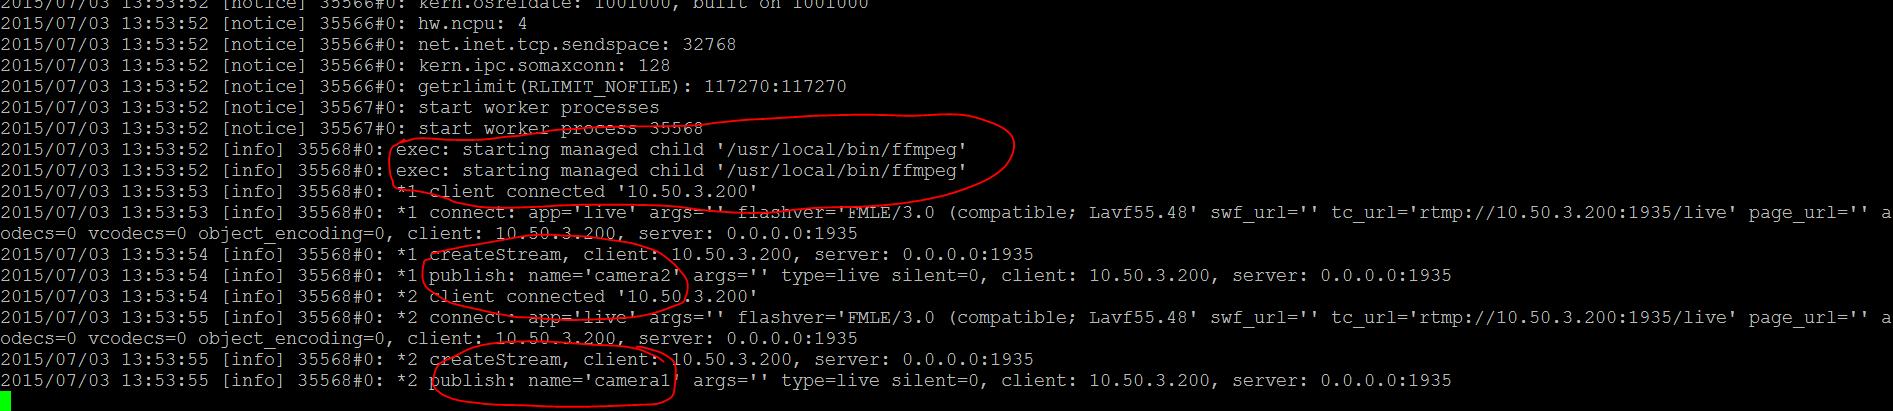 nginx-error-log